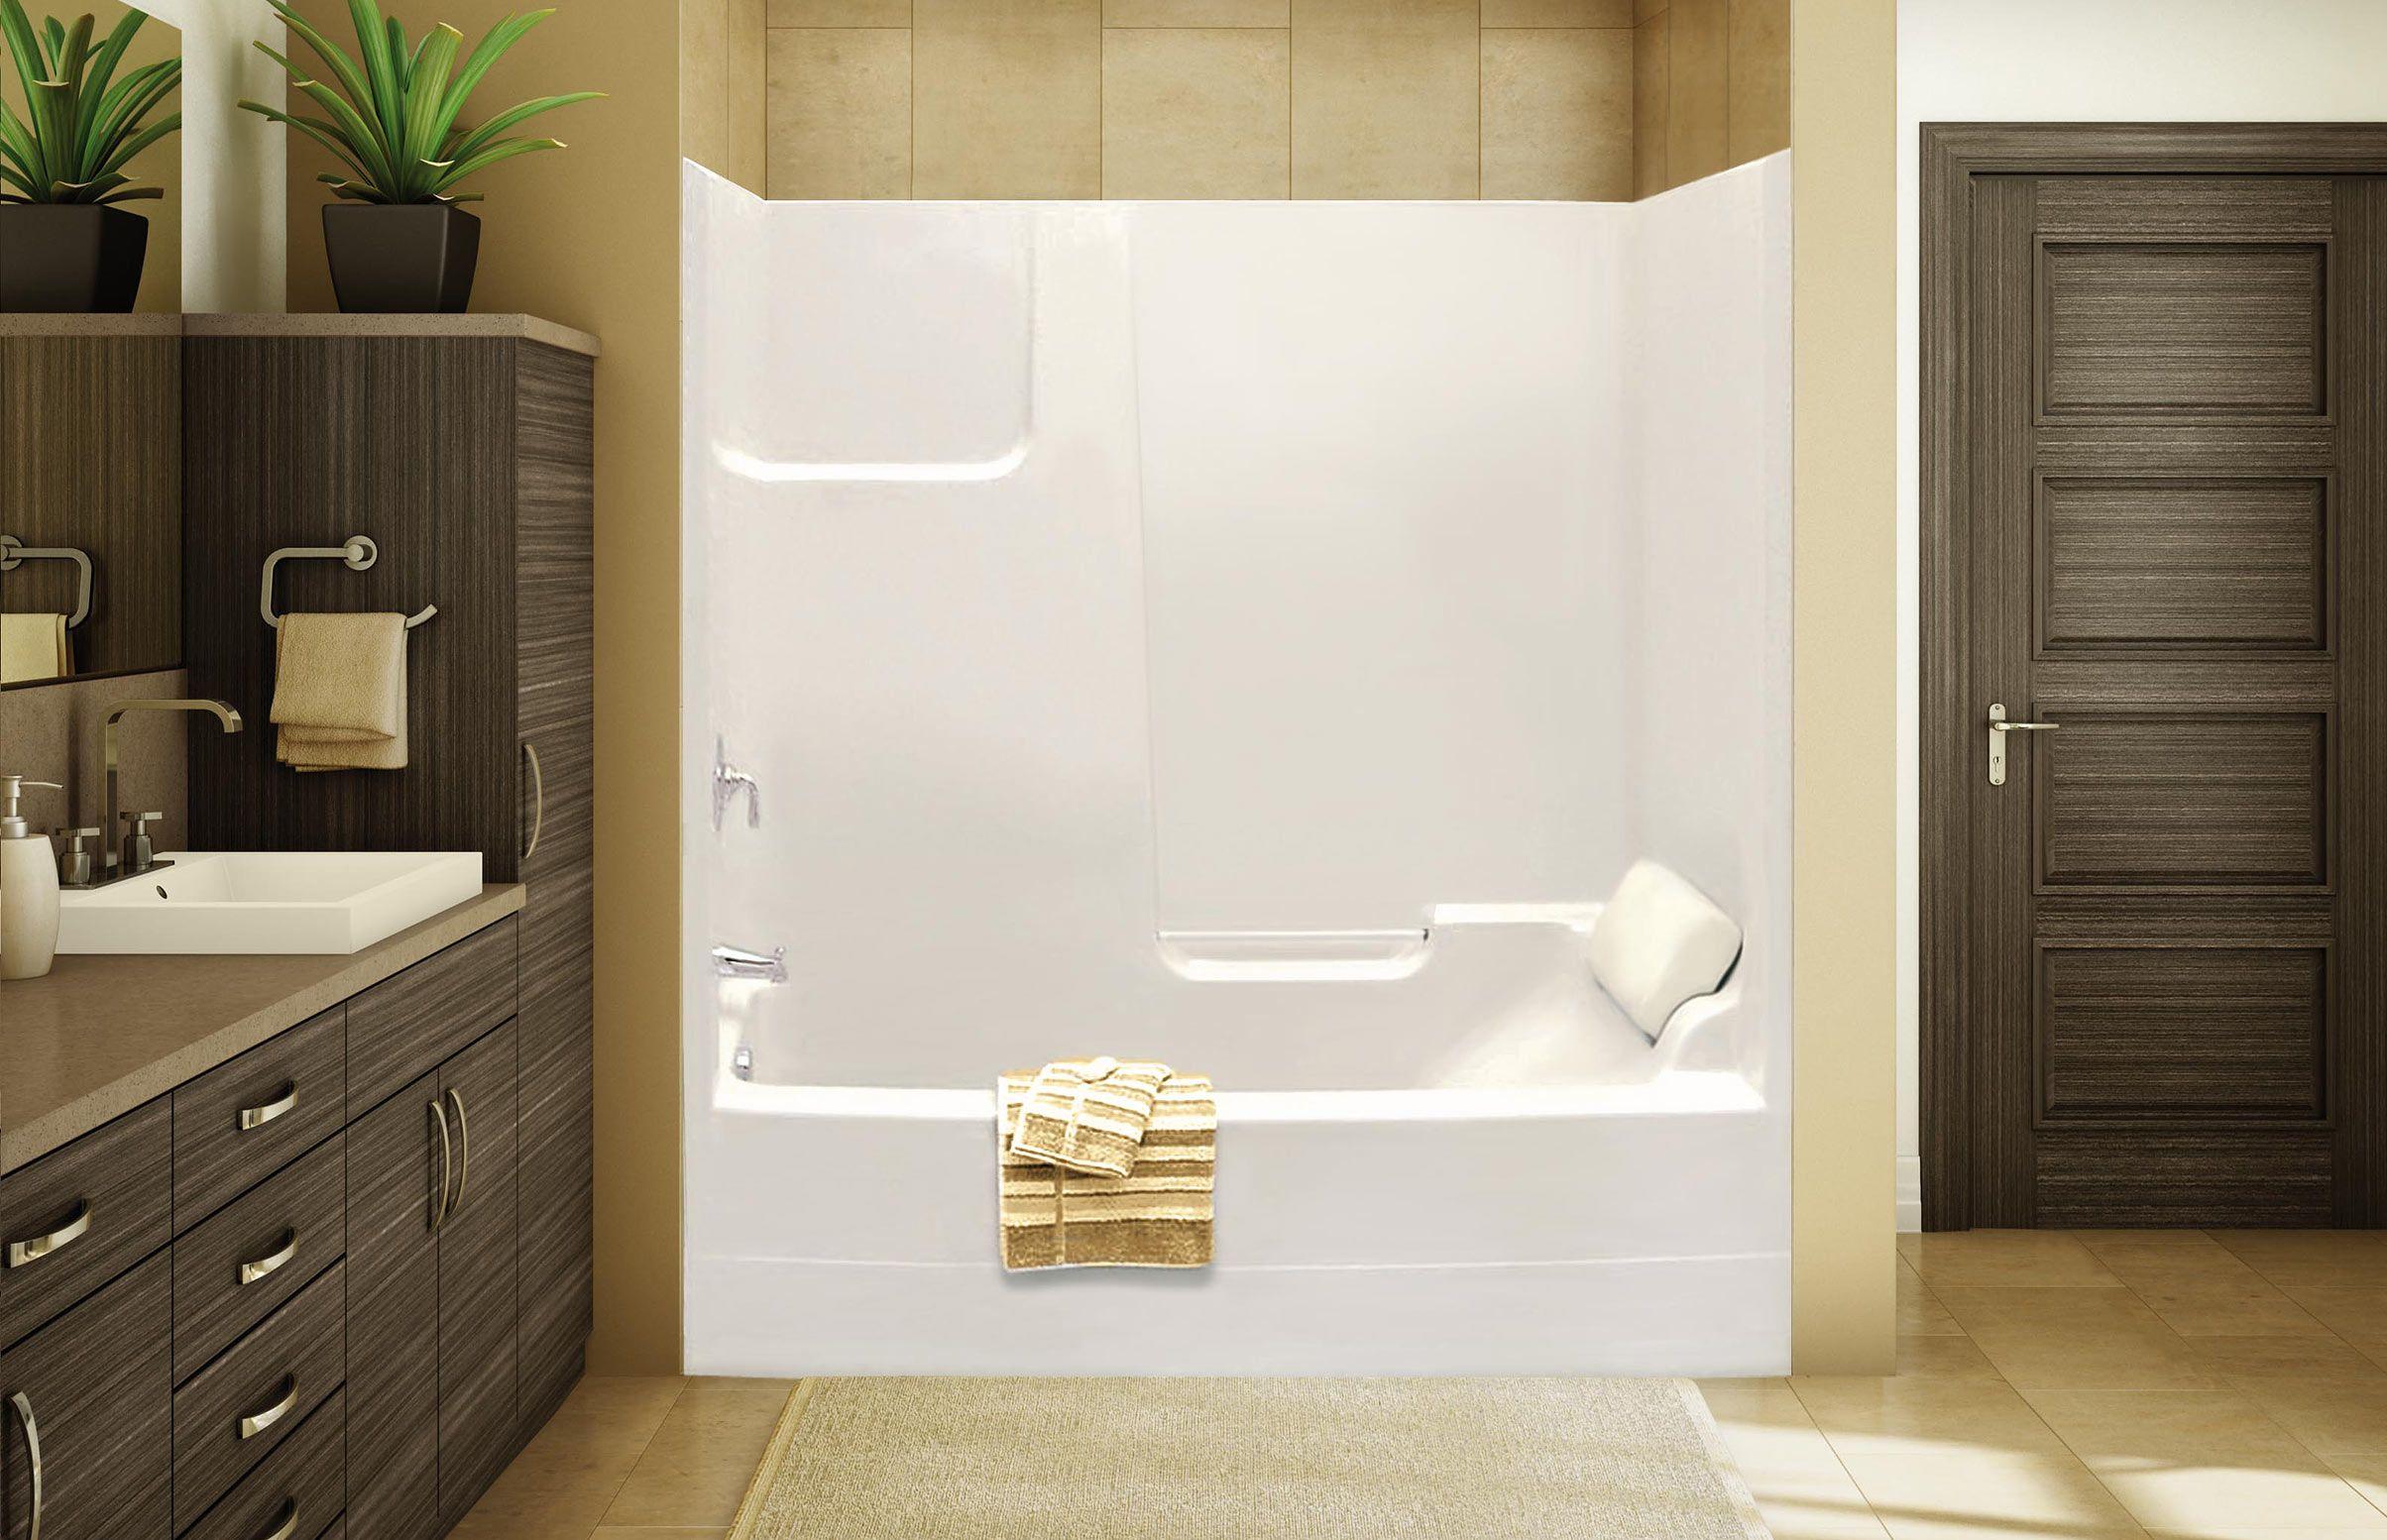 TSEA72 Alcove or Tub showers bathtub - MAAX Professional   DIY ...